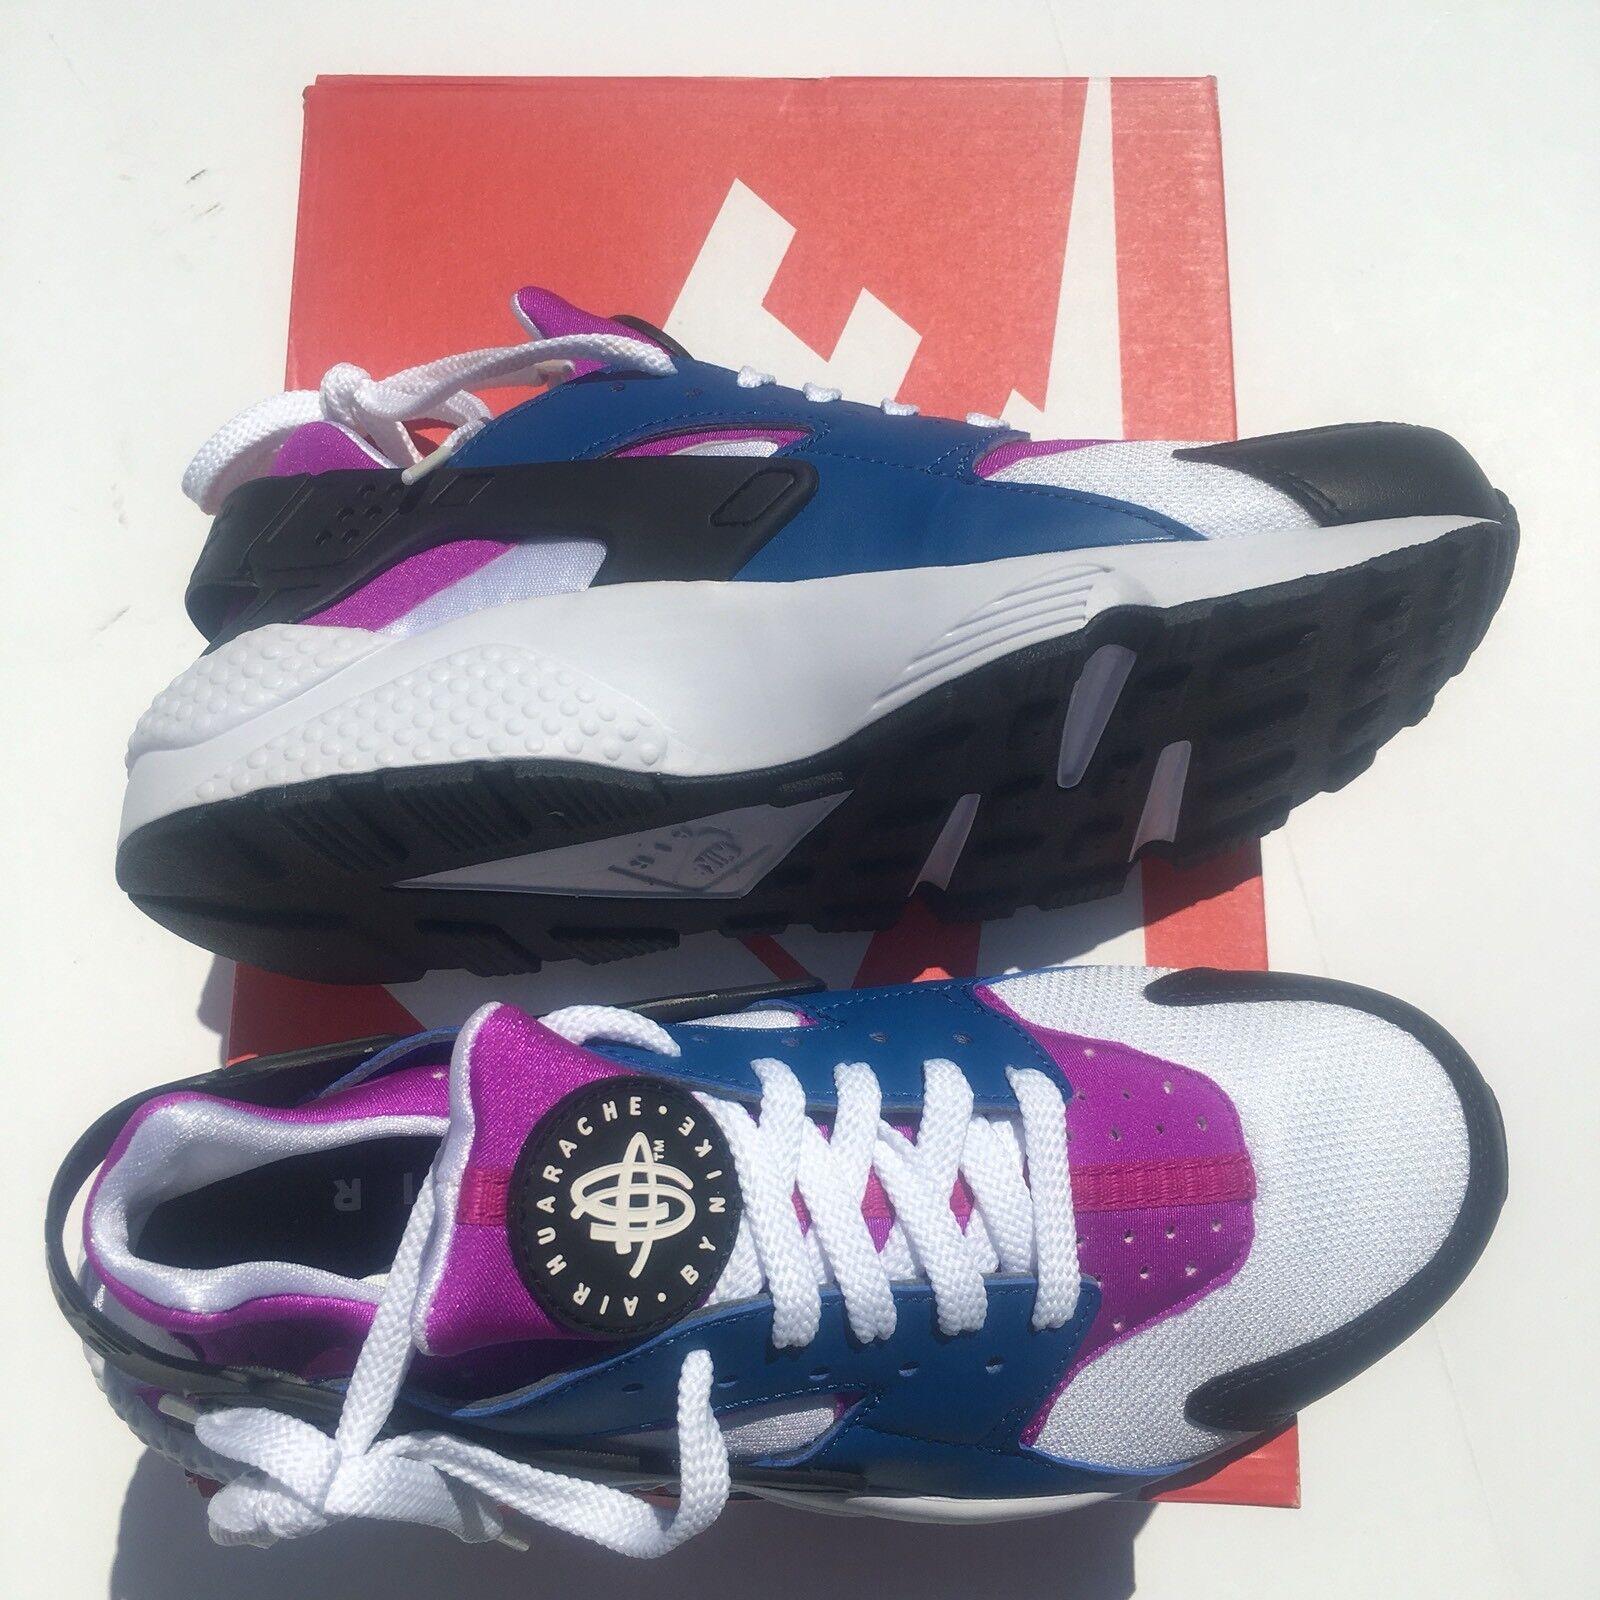 acd0b76fe56c NEW Nike Air Huarache Mens Shoes Size 9 9 9 Blue Jay White Hyper-Violet